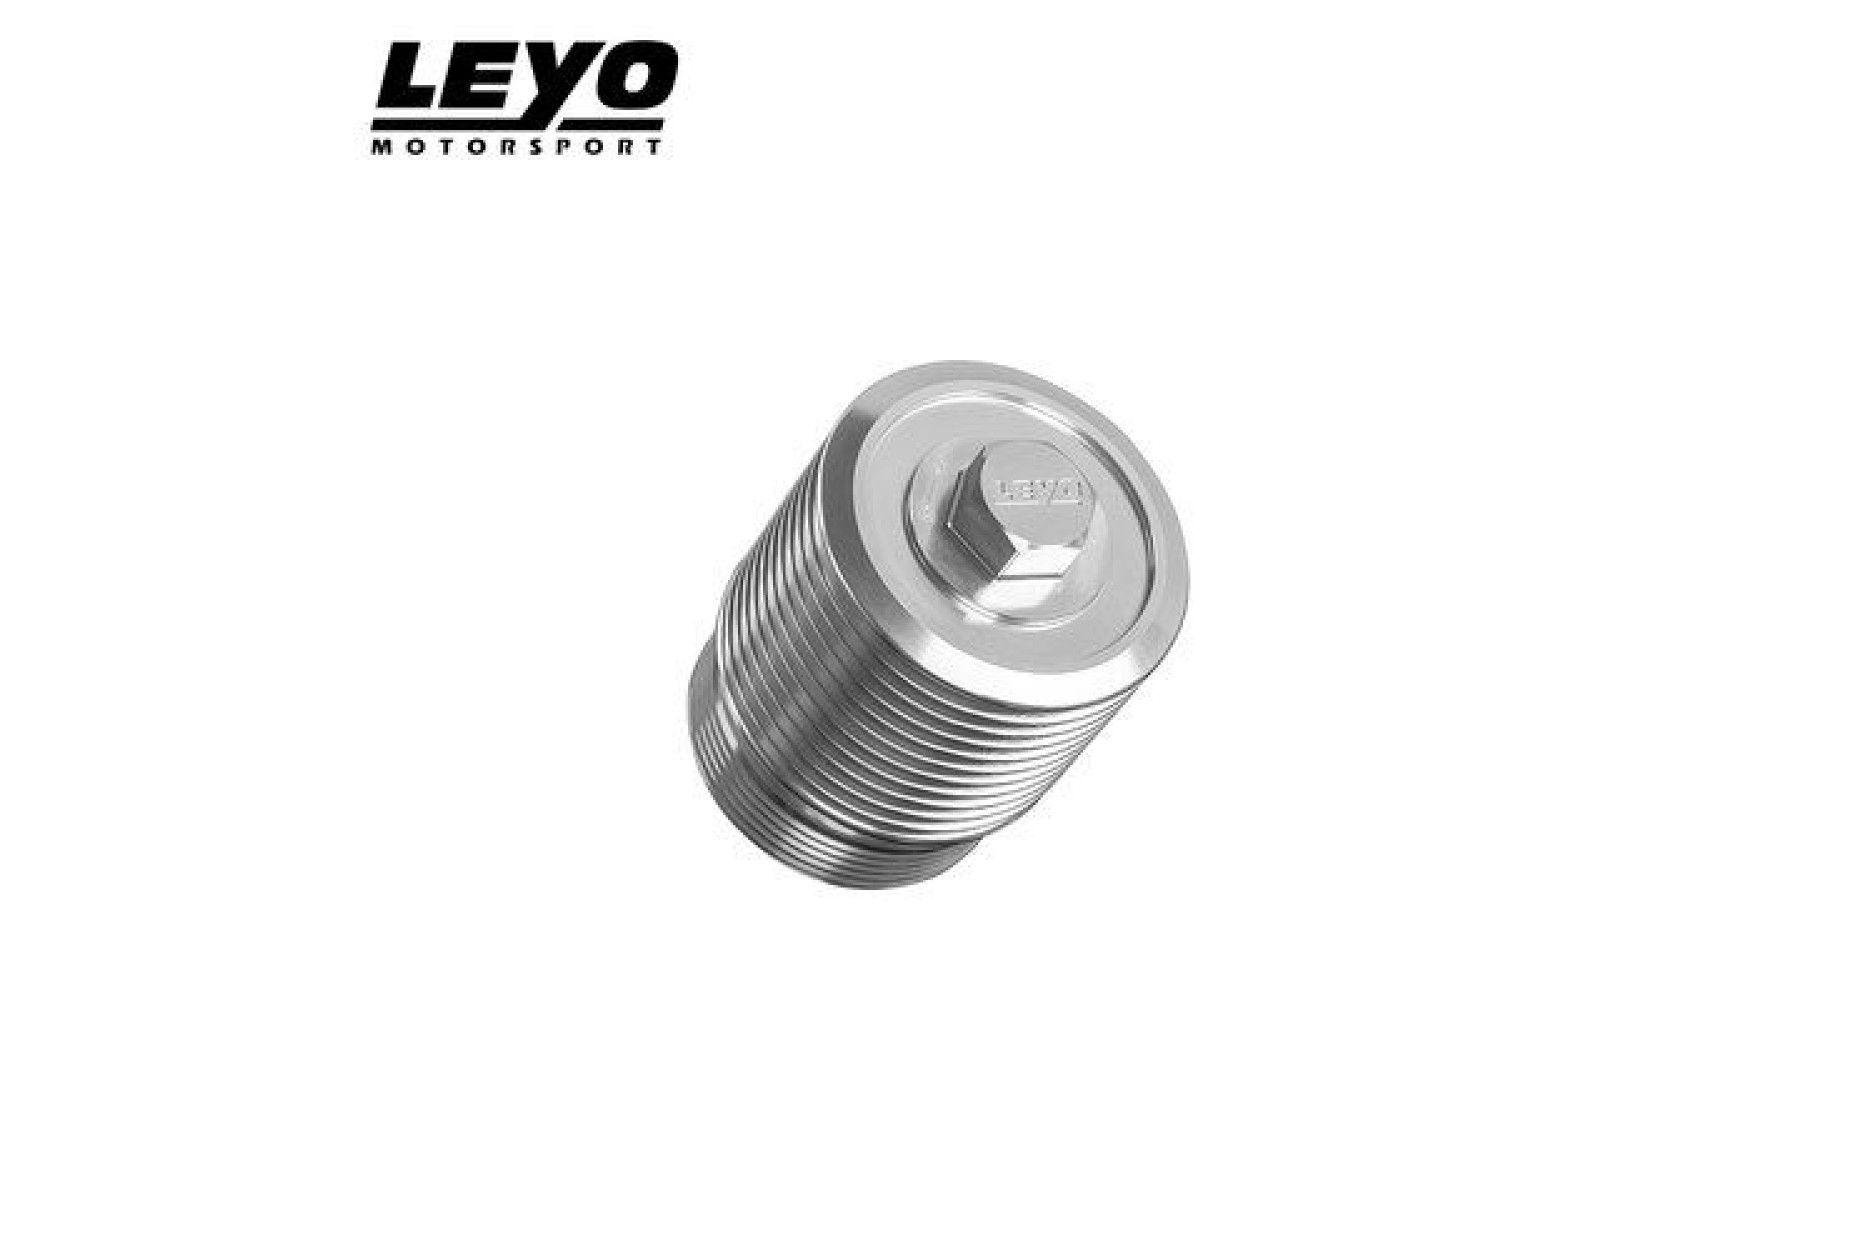 Leyo DSG Ölfilter-Gehäuse für VAG EA888 1.8-2.0TSI silber